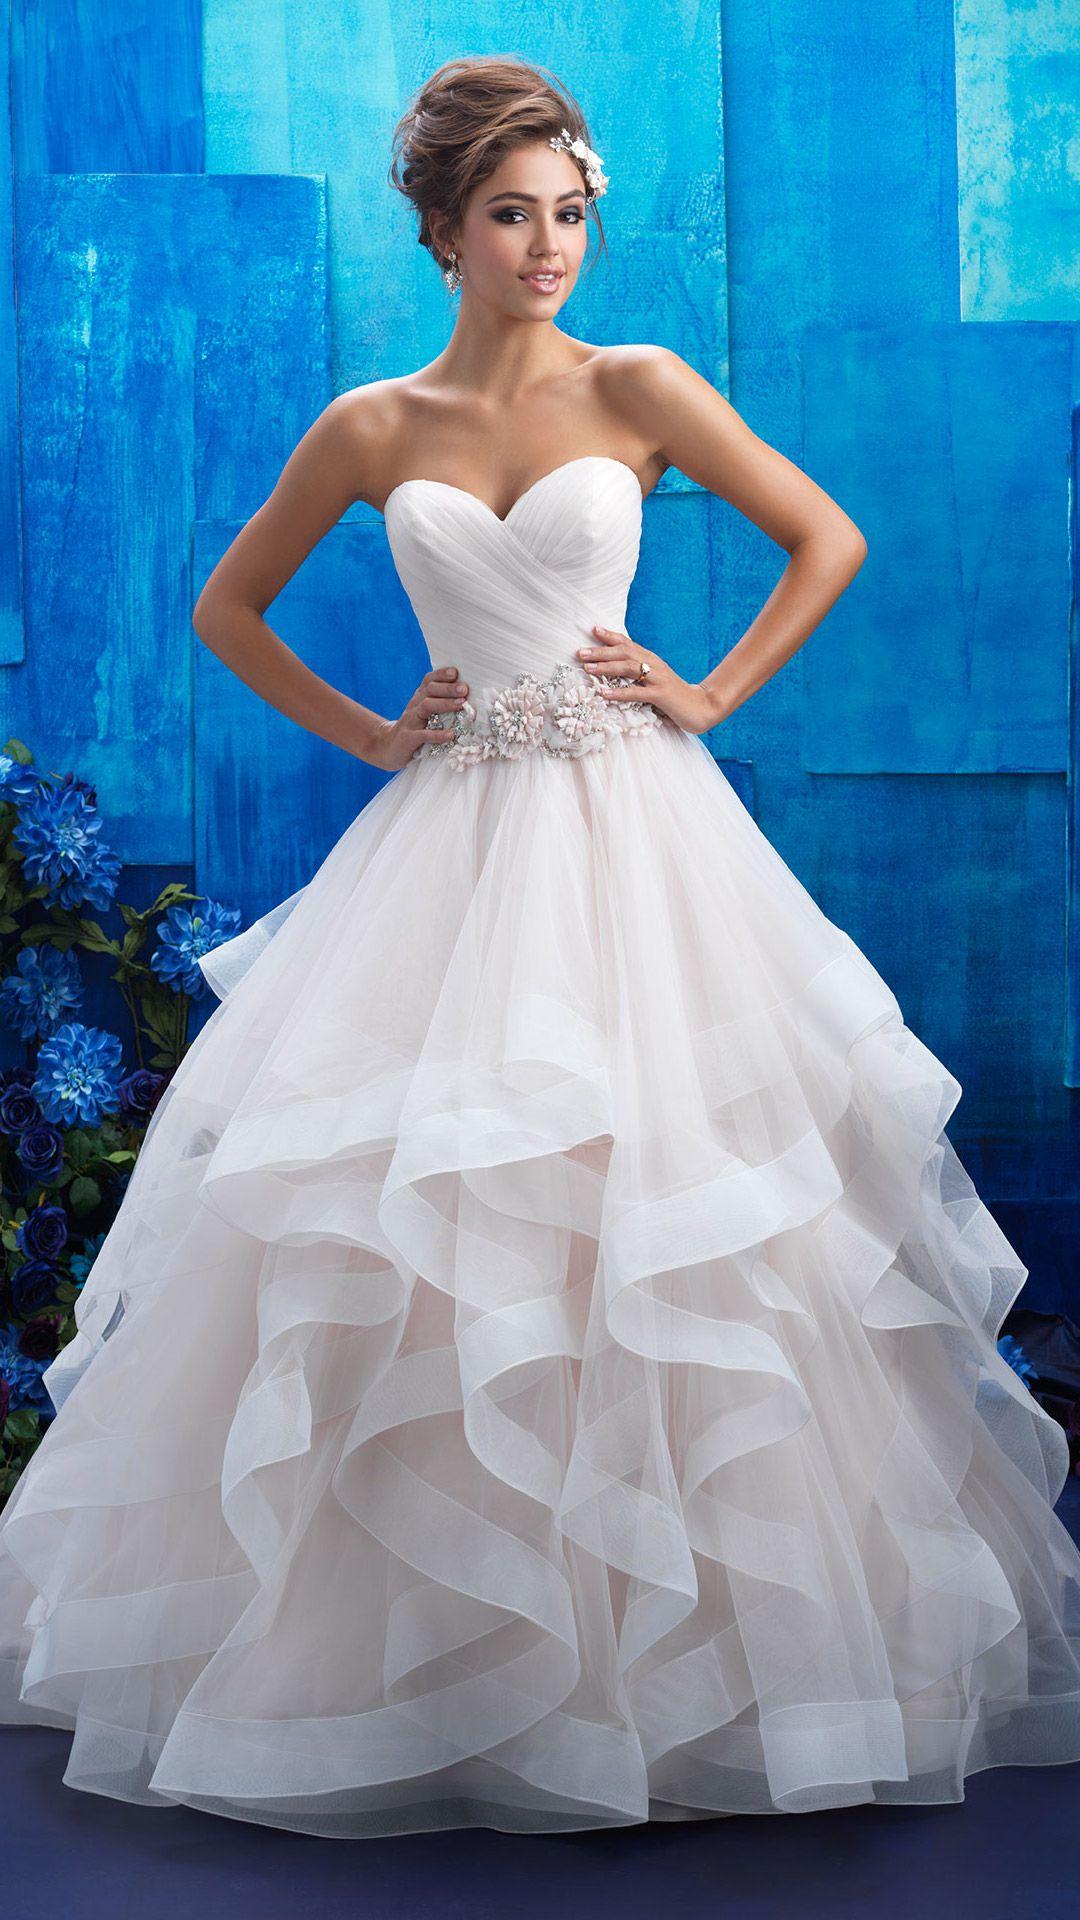 Sheer top wedding dress  instagram  saminashortyali  pinterest  SaminaAli  dresses